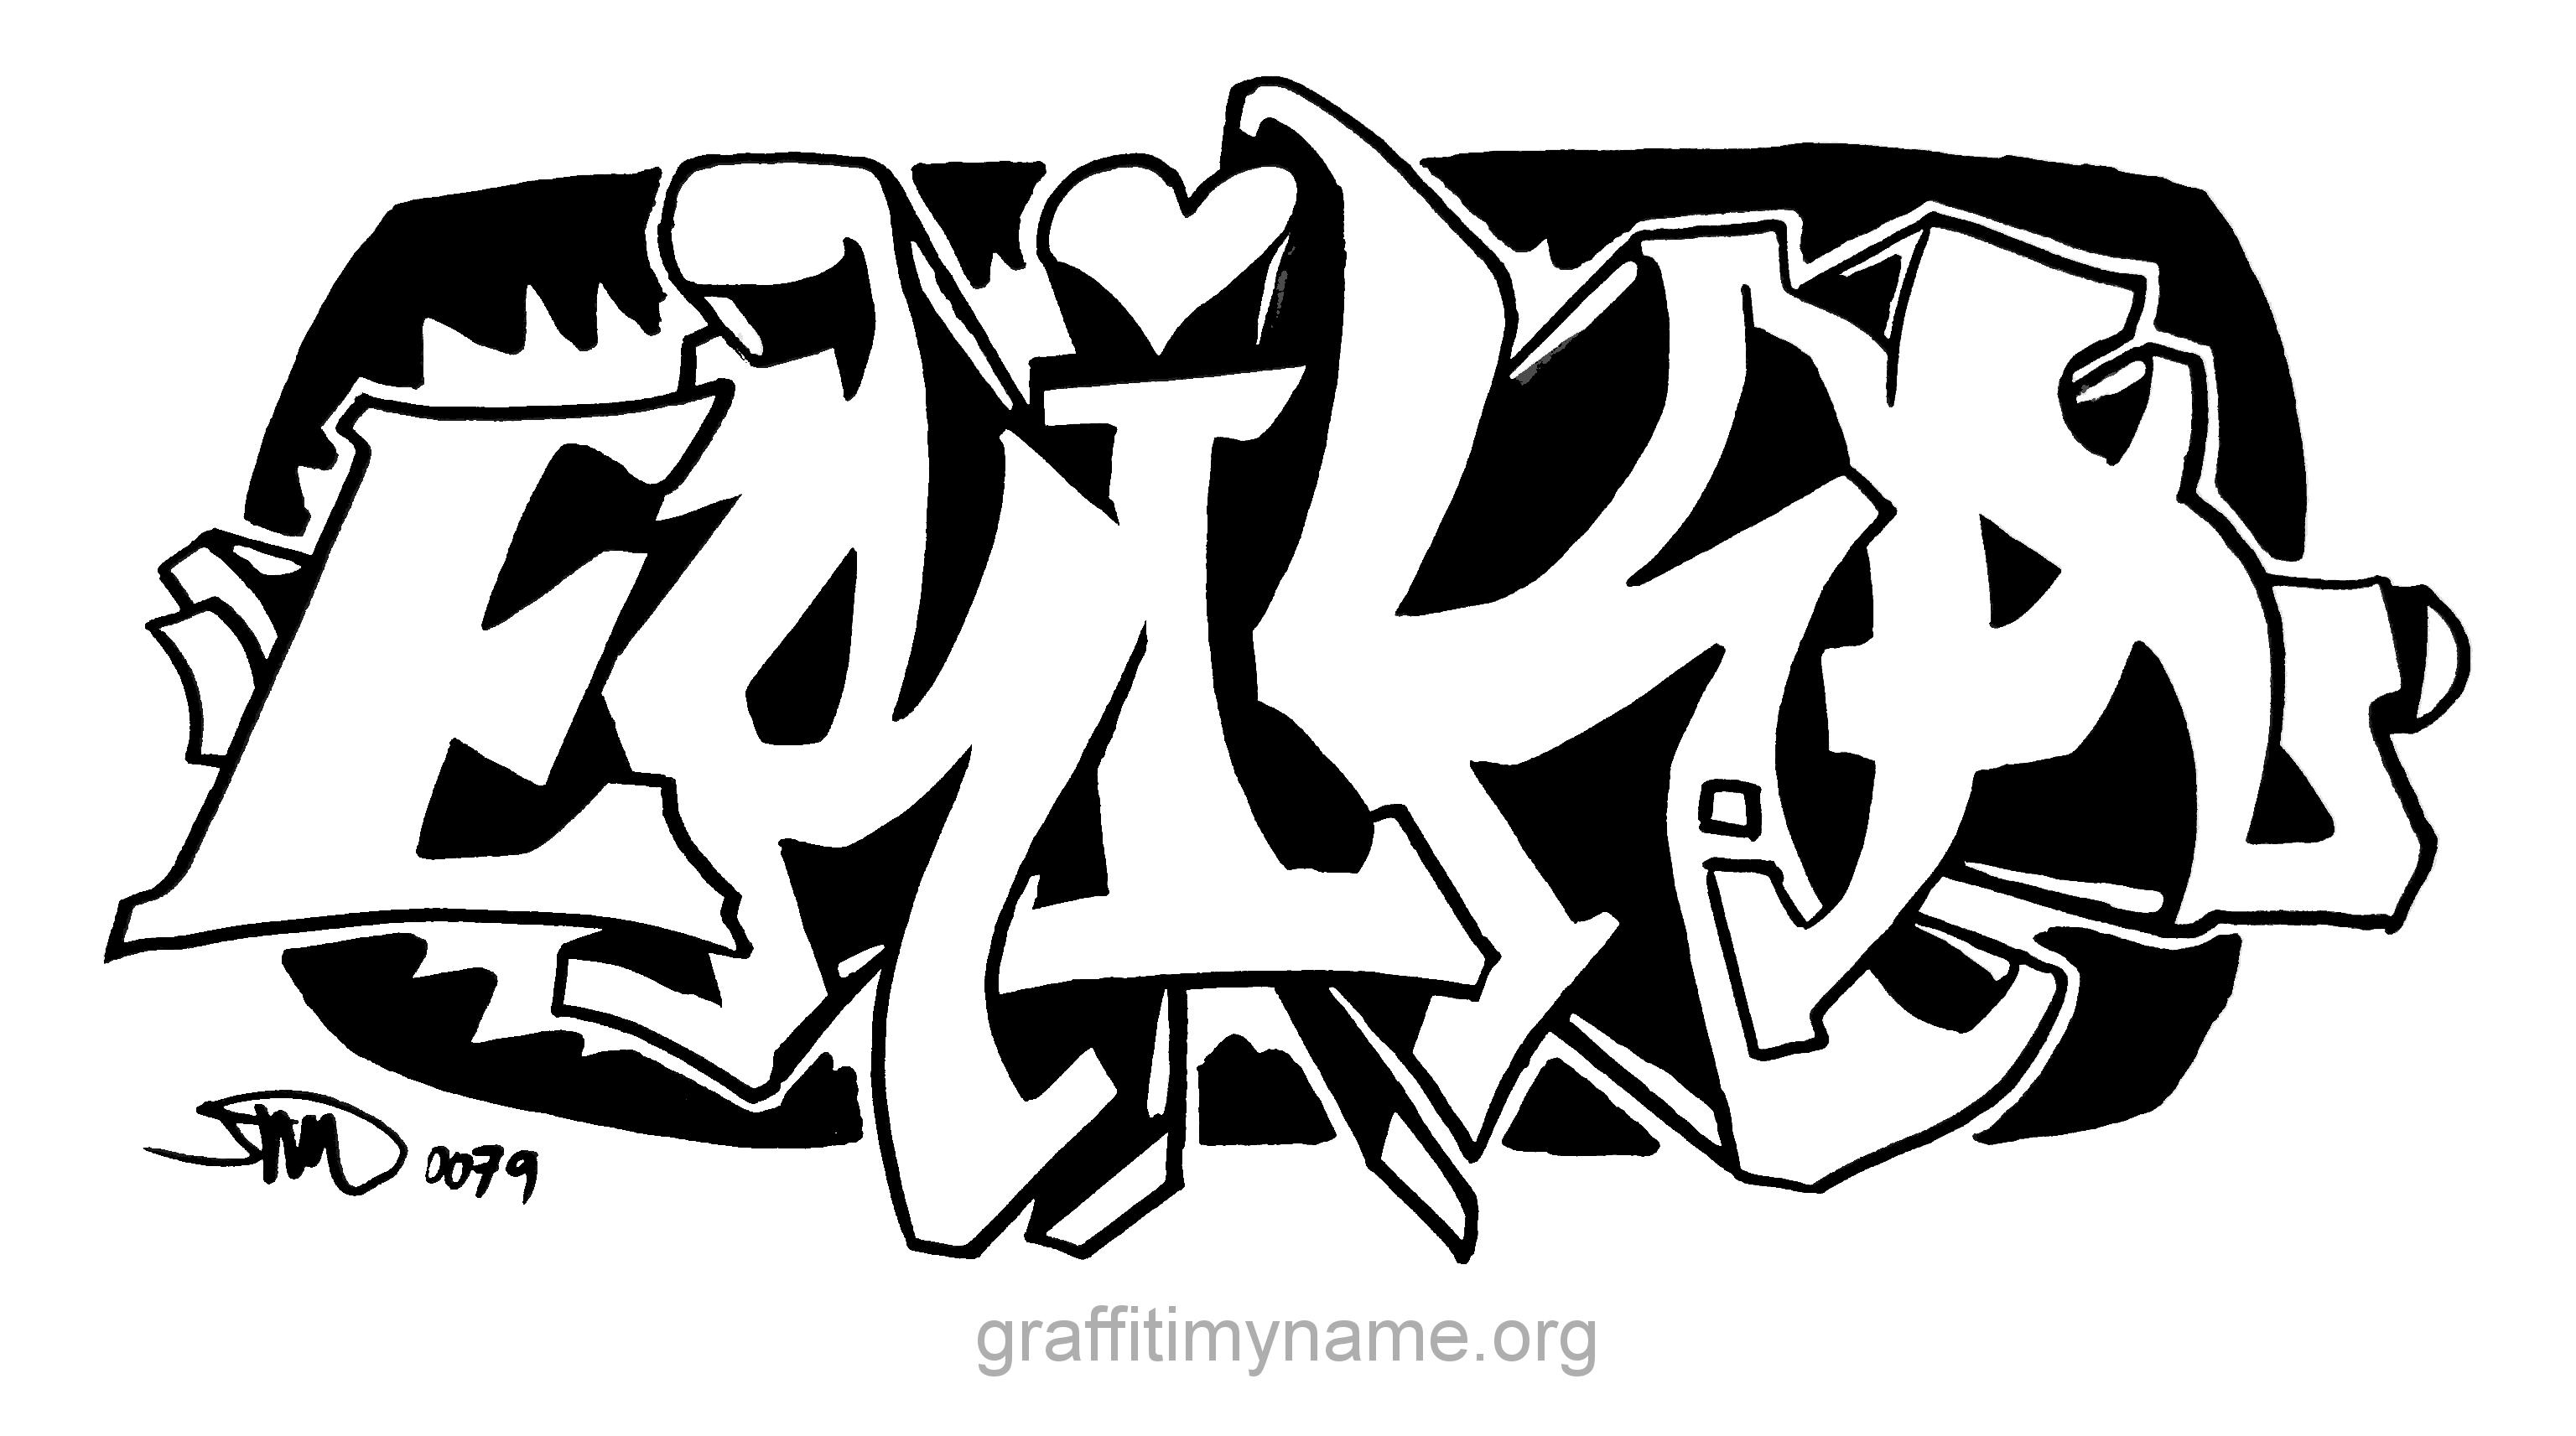 erika - Graffiti My Name | Art | Pinterest | Ponerse y Coser